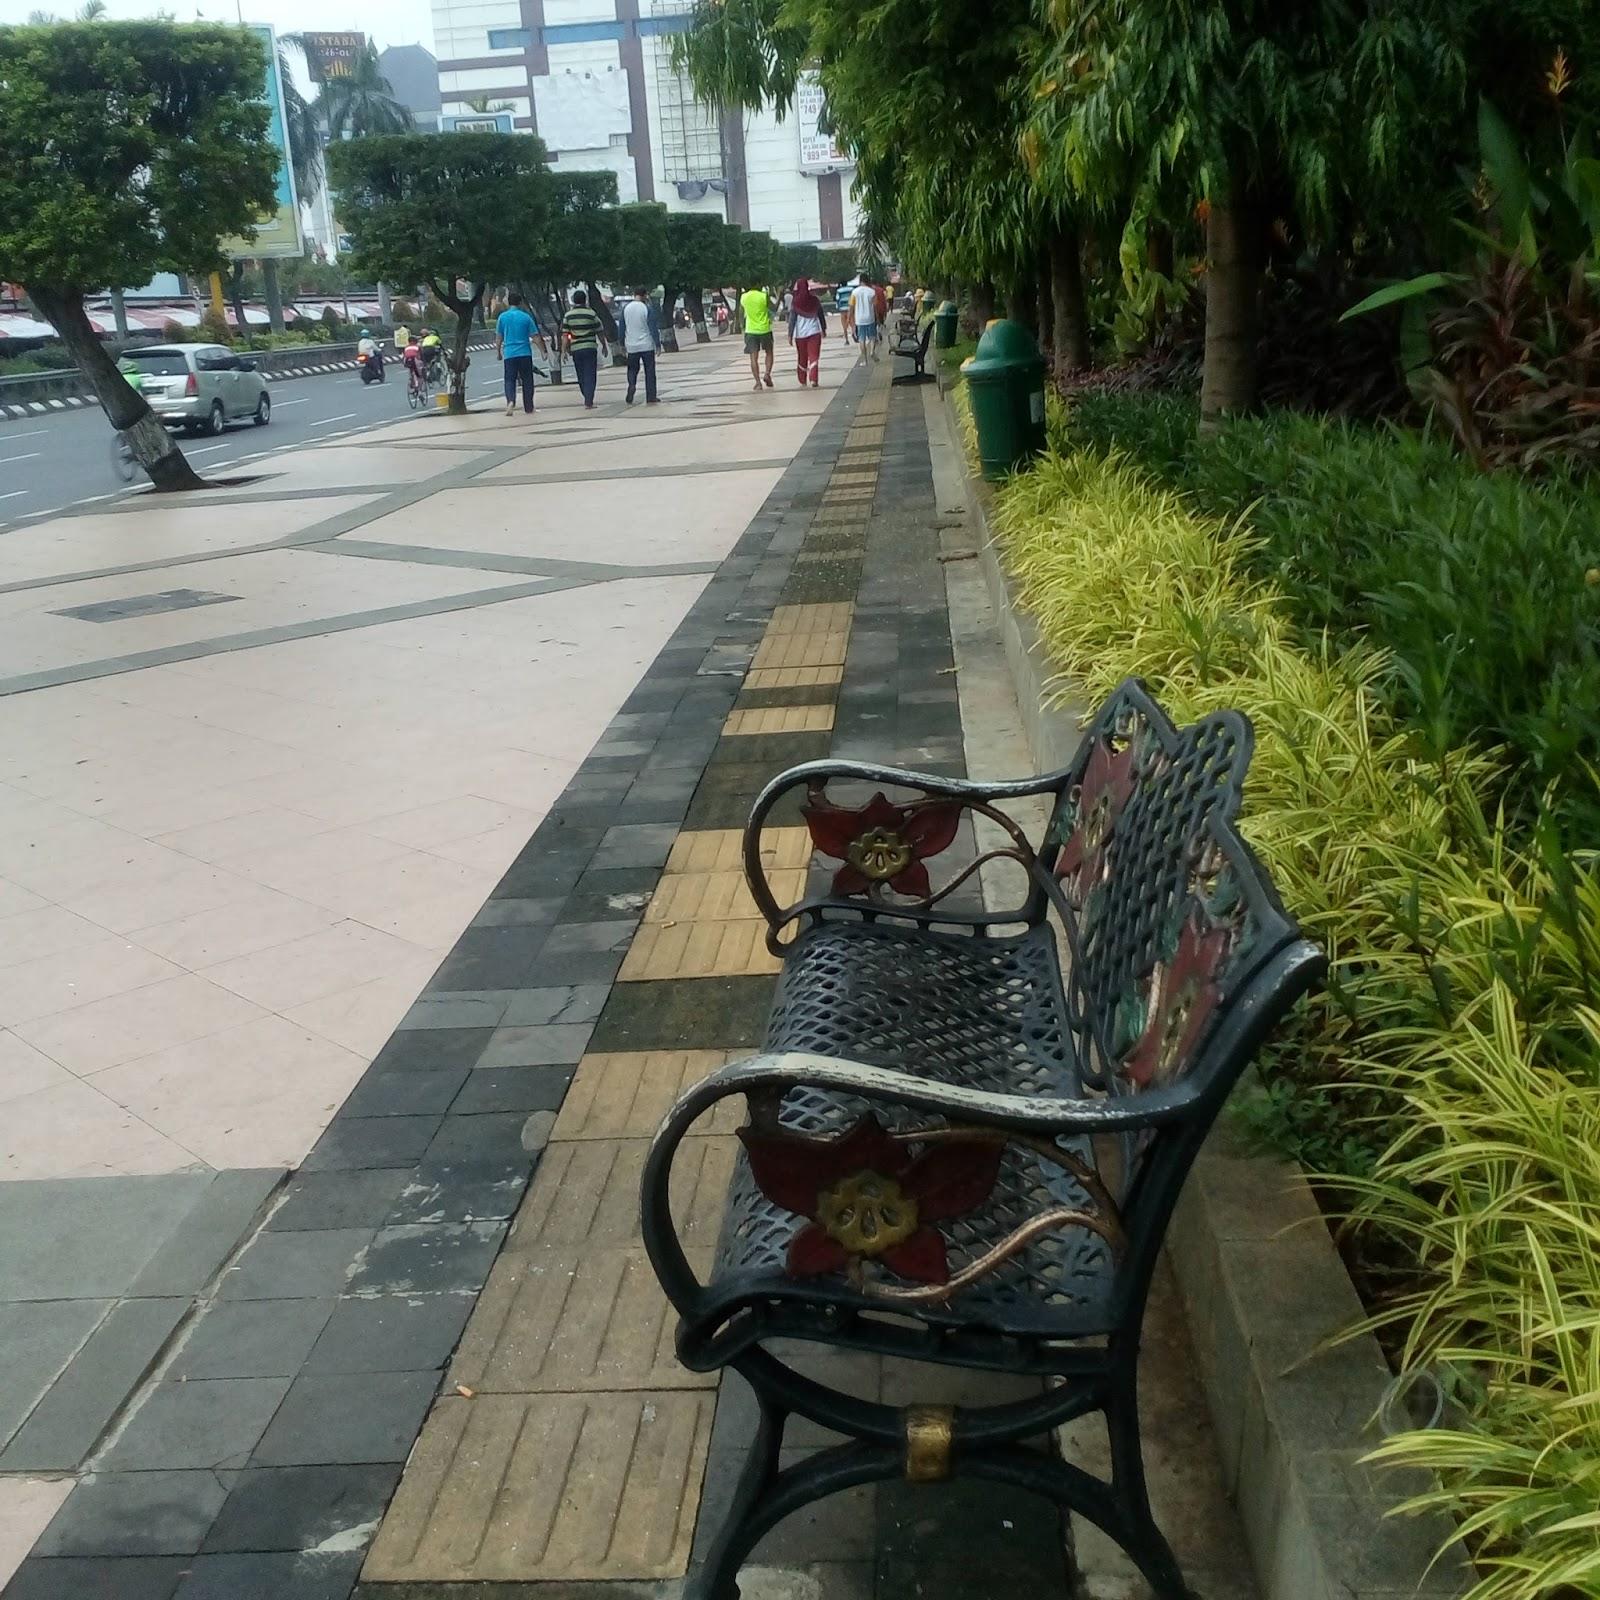 Gerakan Restorasi Sosial (Grass): Pedestrian Kota Semarang